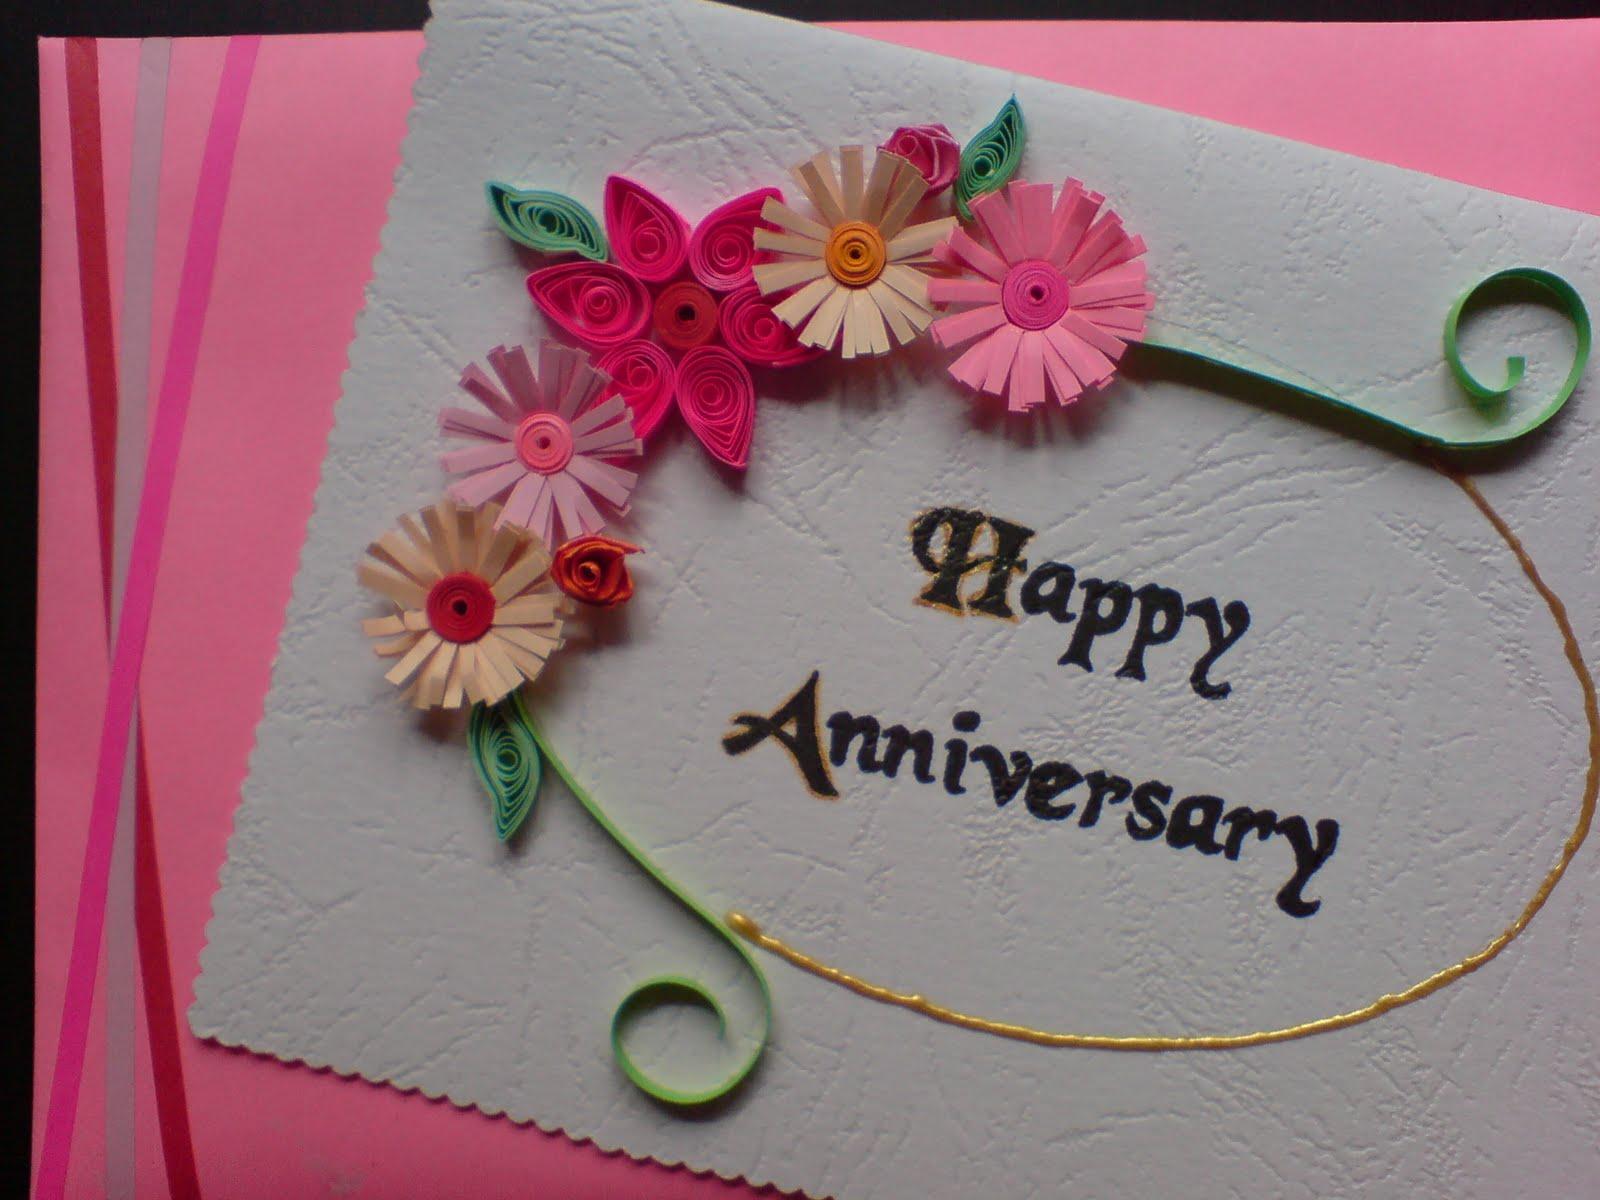 Handmade Wedding Anniversary Card Designs